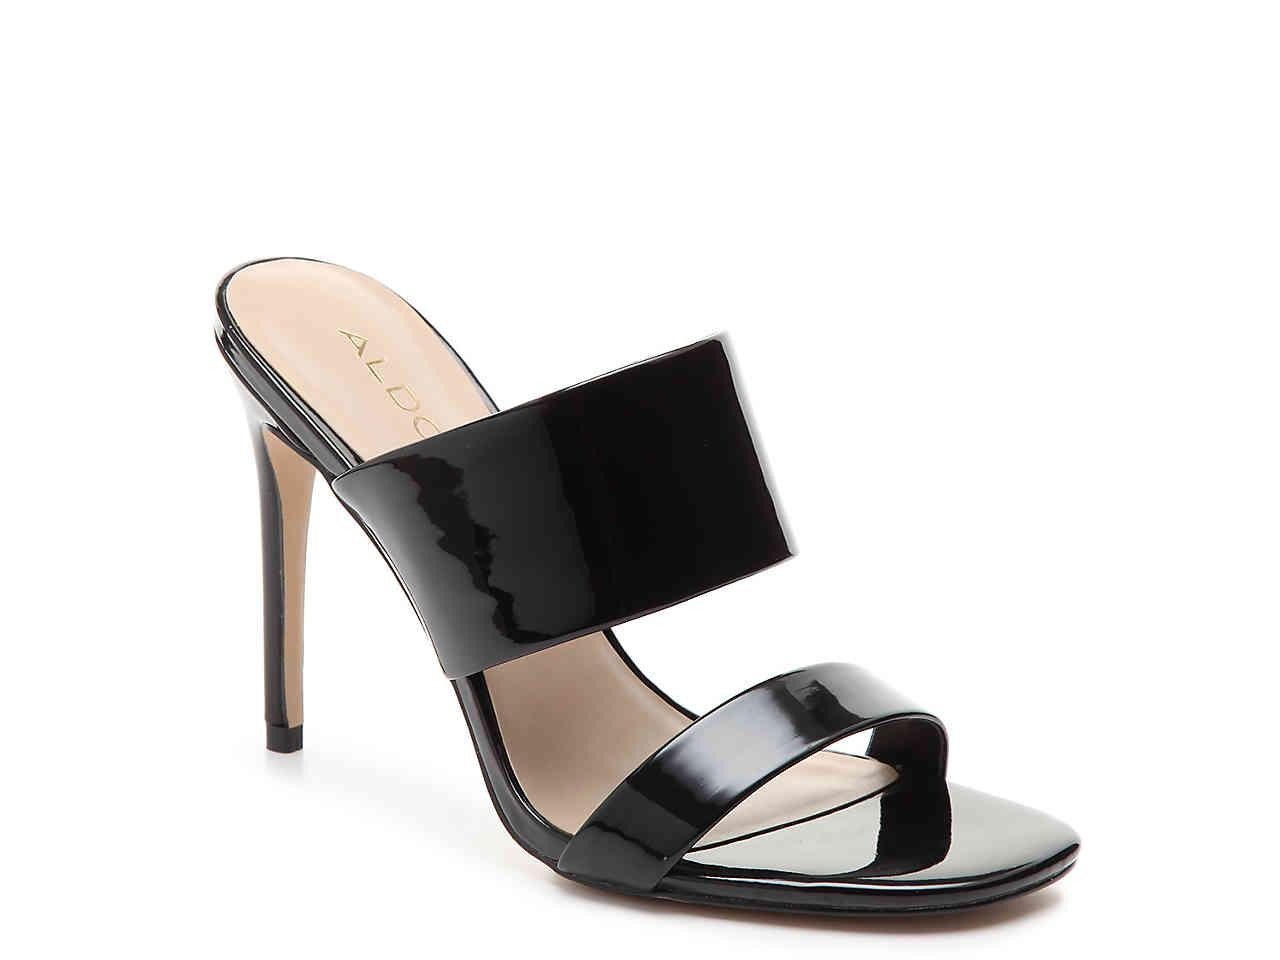 ede2c04cefa Lyst - ALDO Froema Sandal in Black